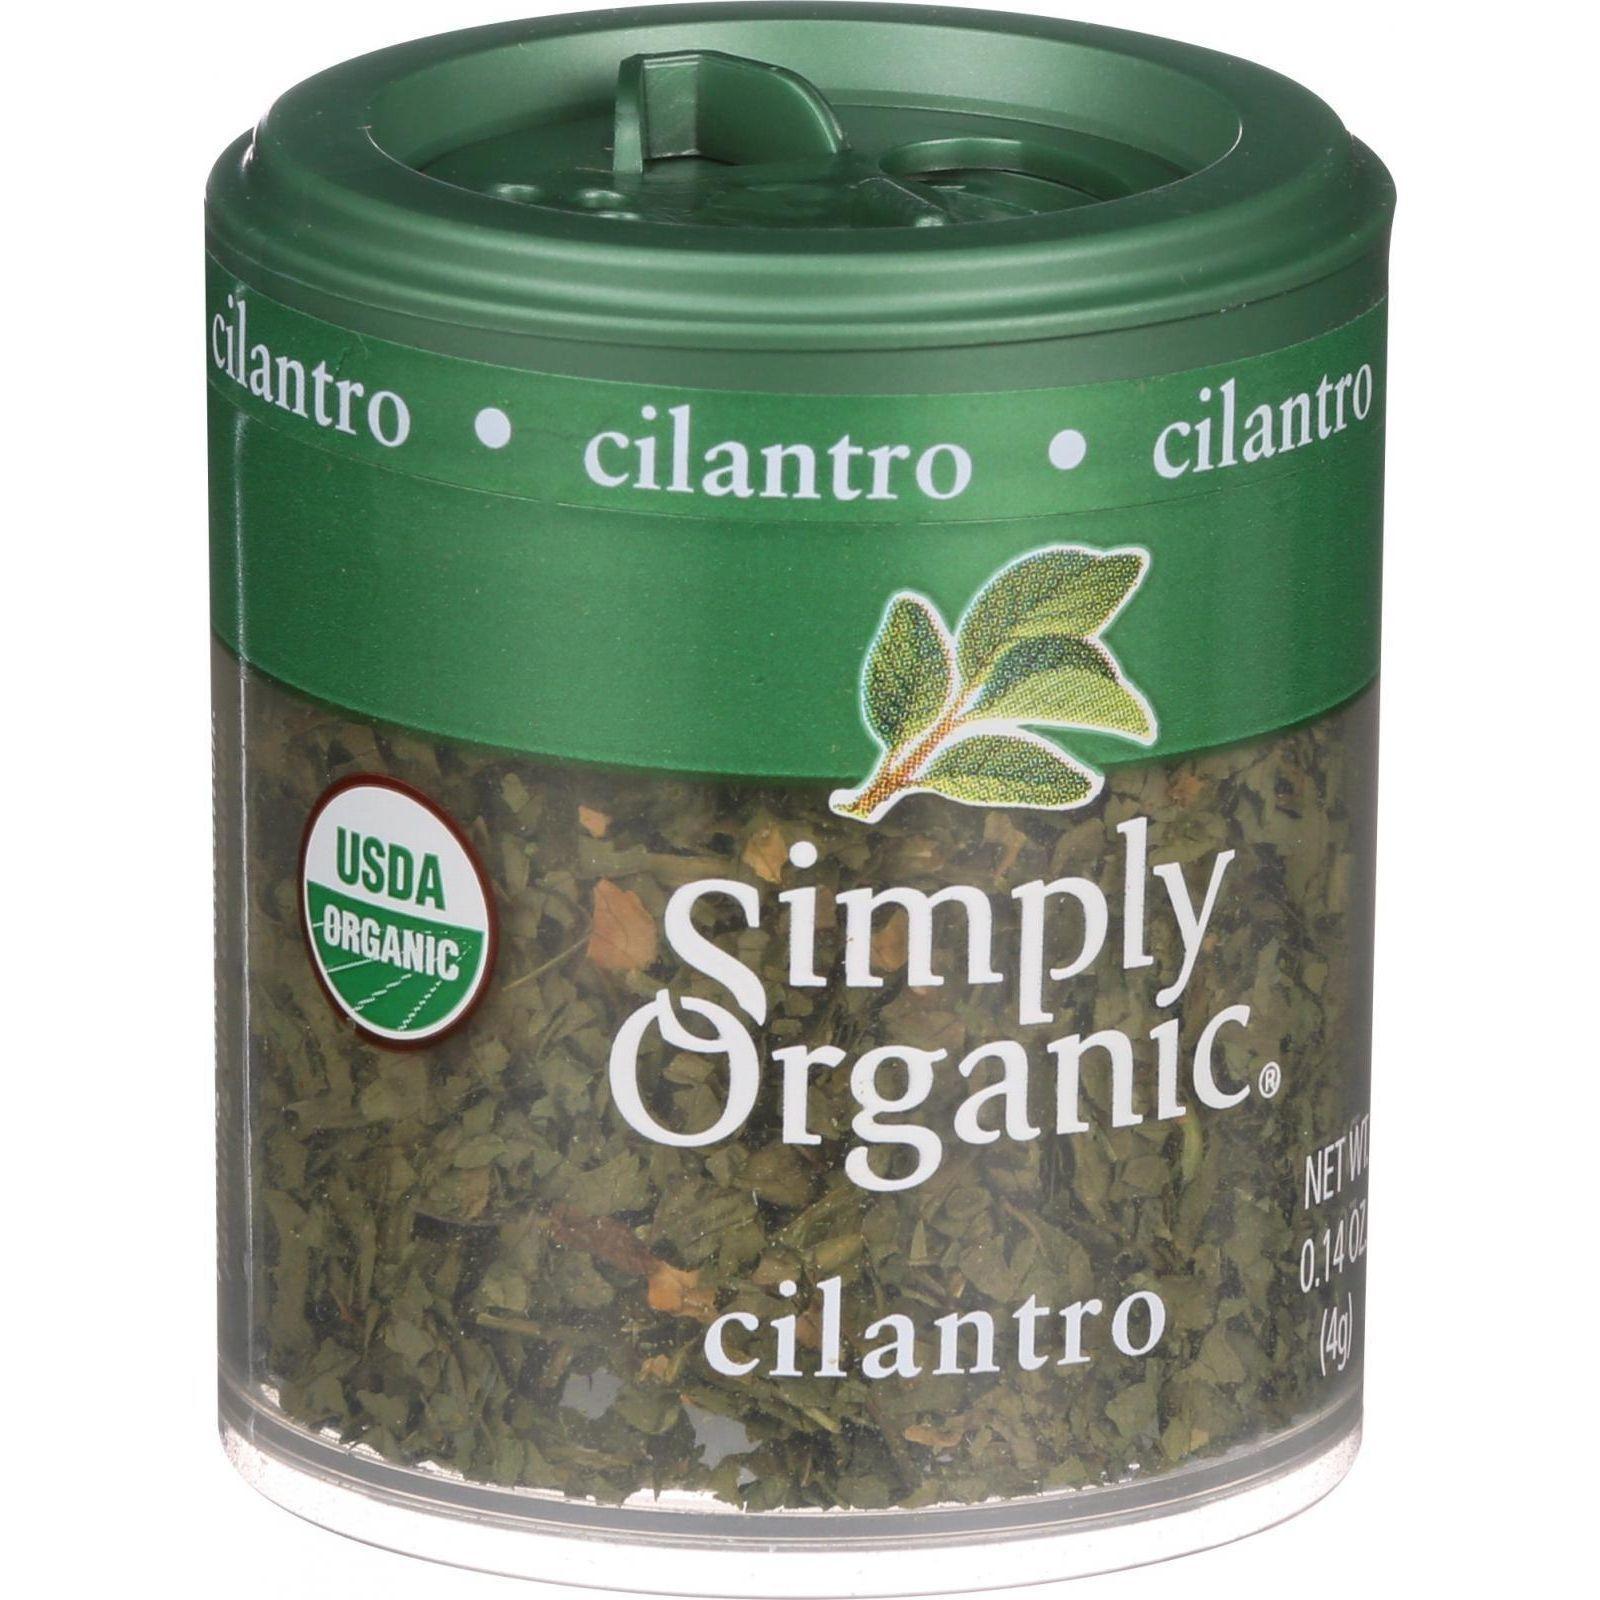 Simply Organic Cilantro Leaf - Organic - Cut and Sifted - .14 oz - Case of 6